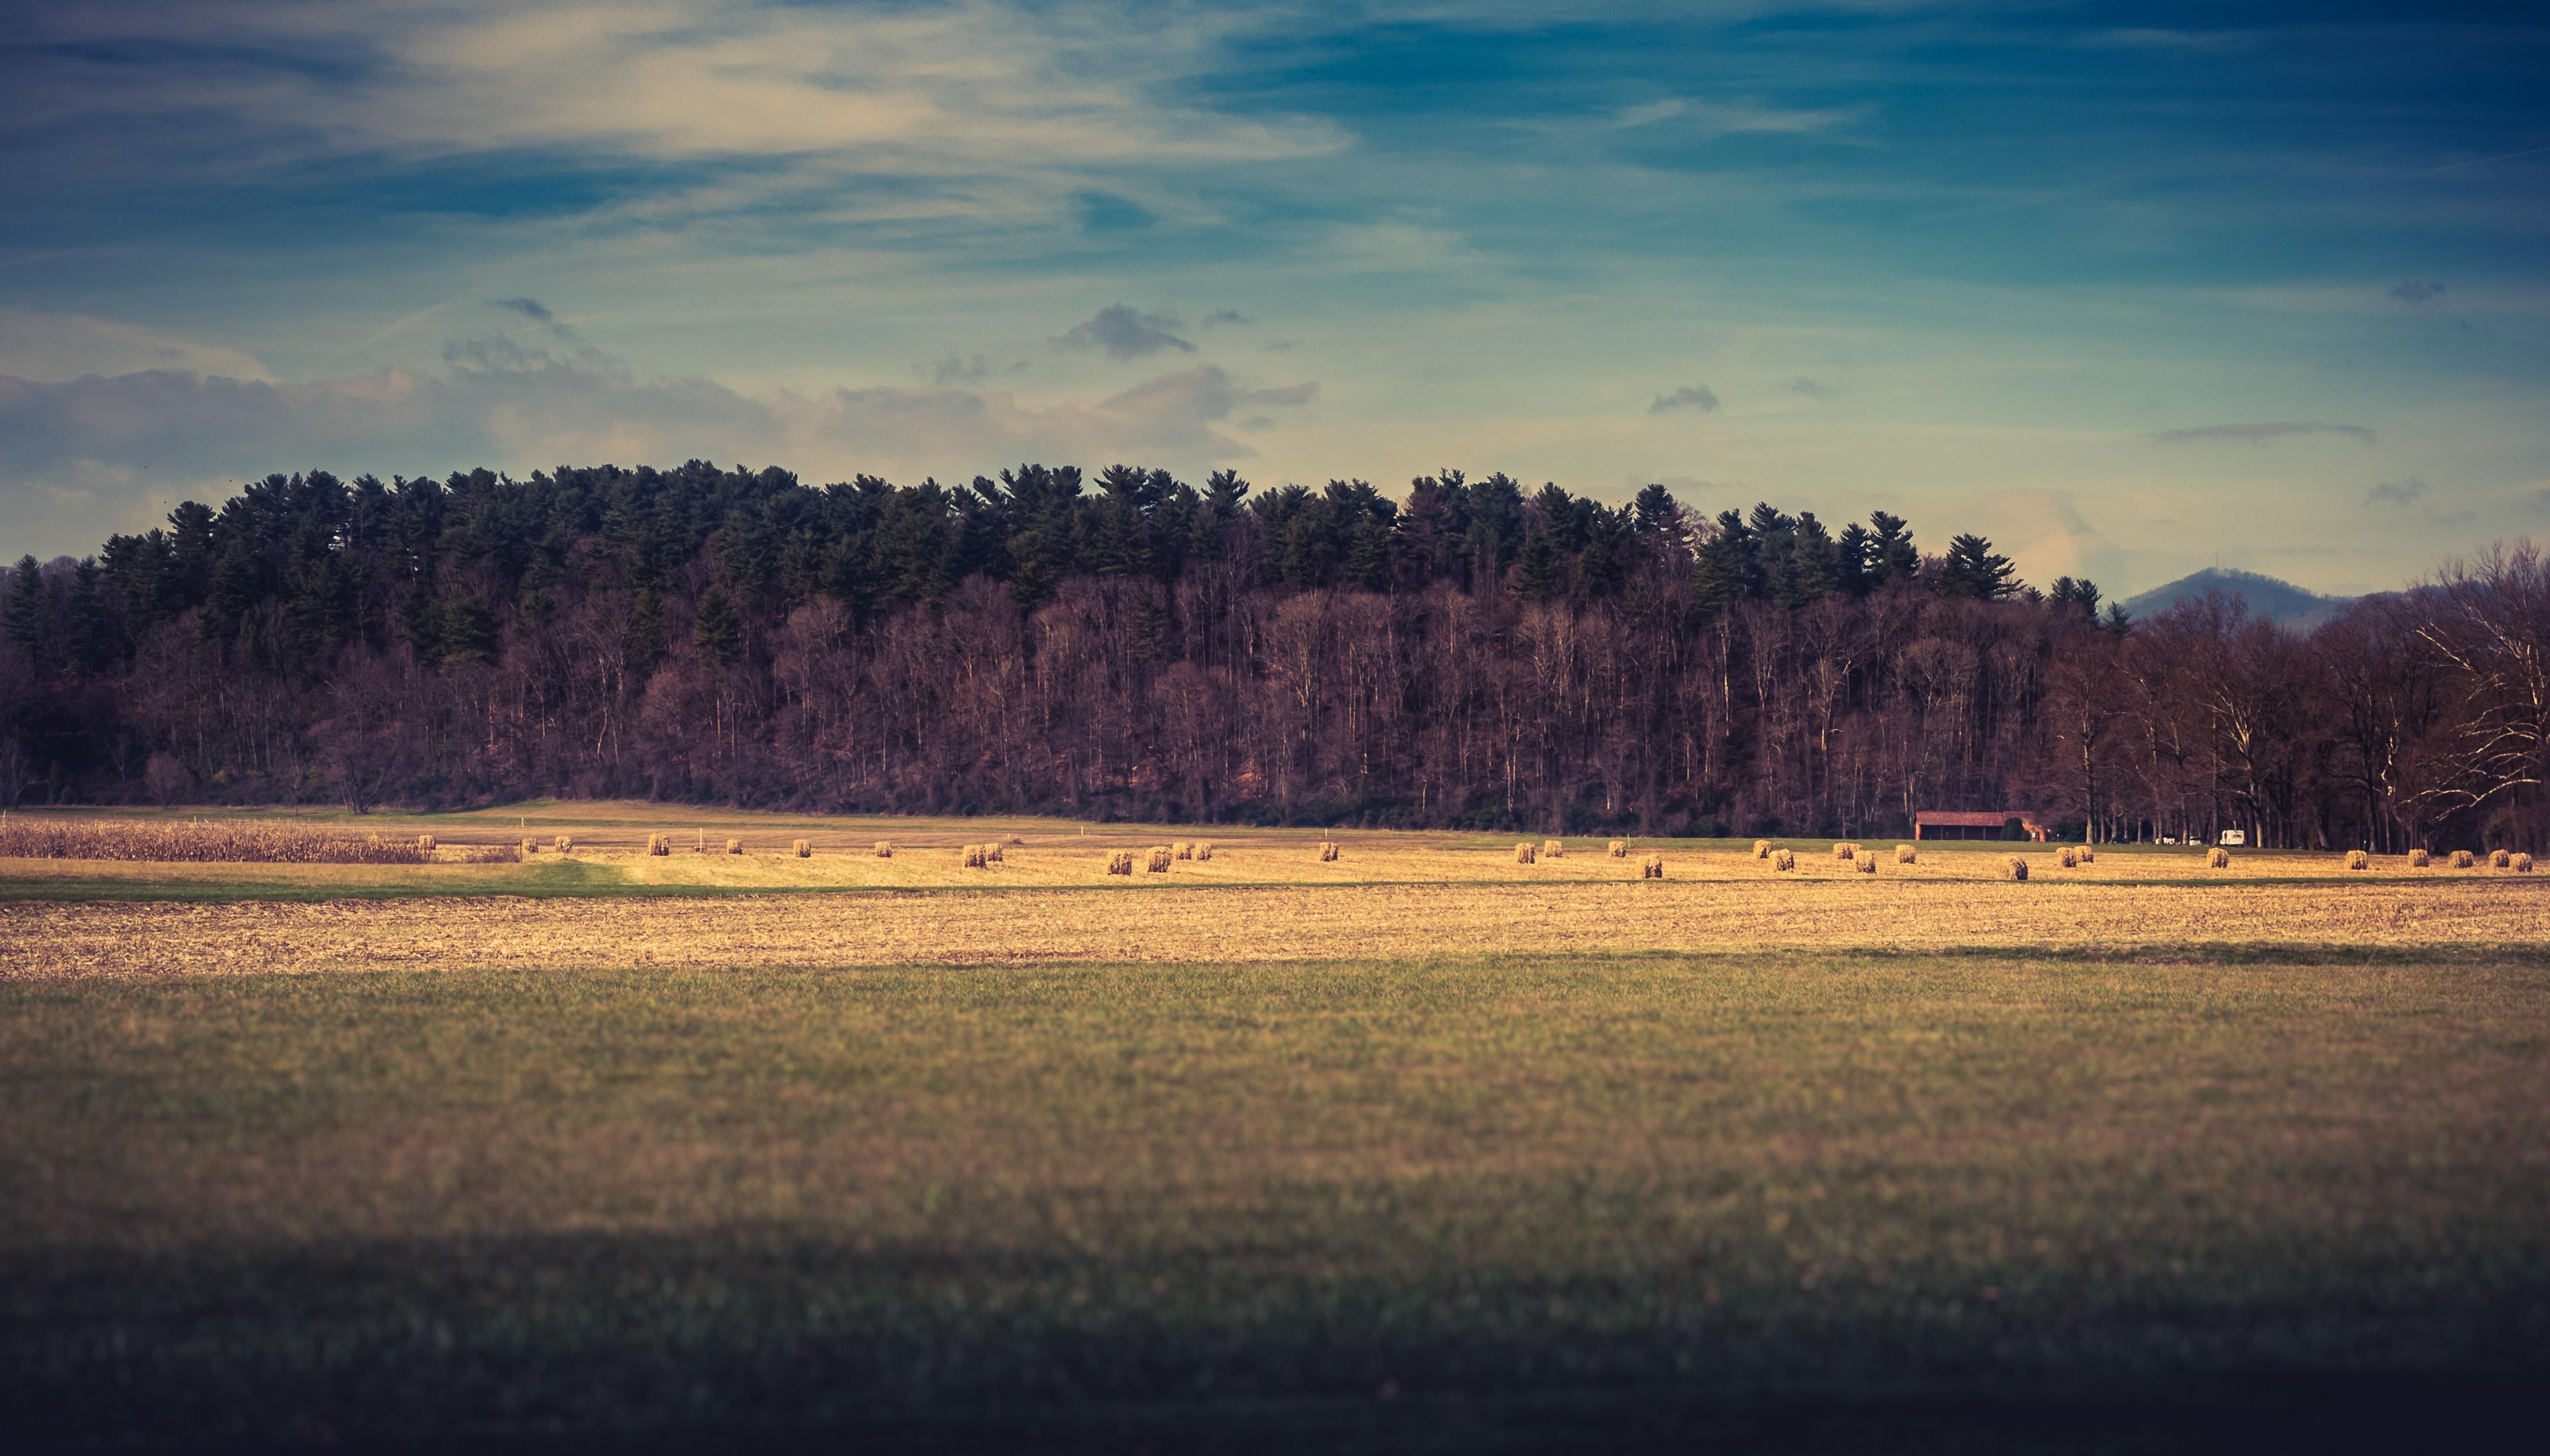 Hay bales in a golden field in Biltmore